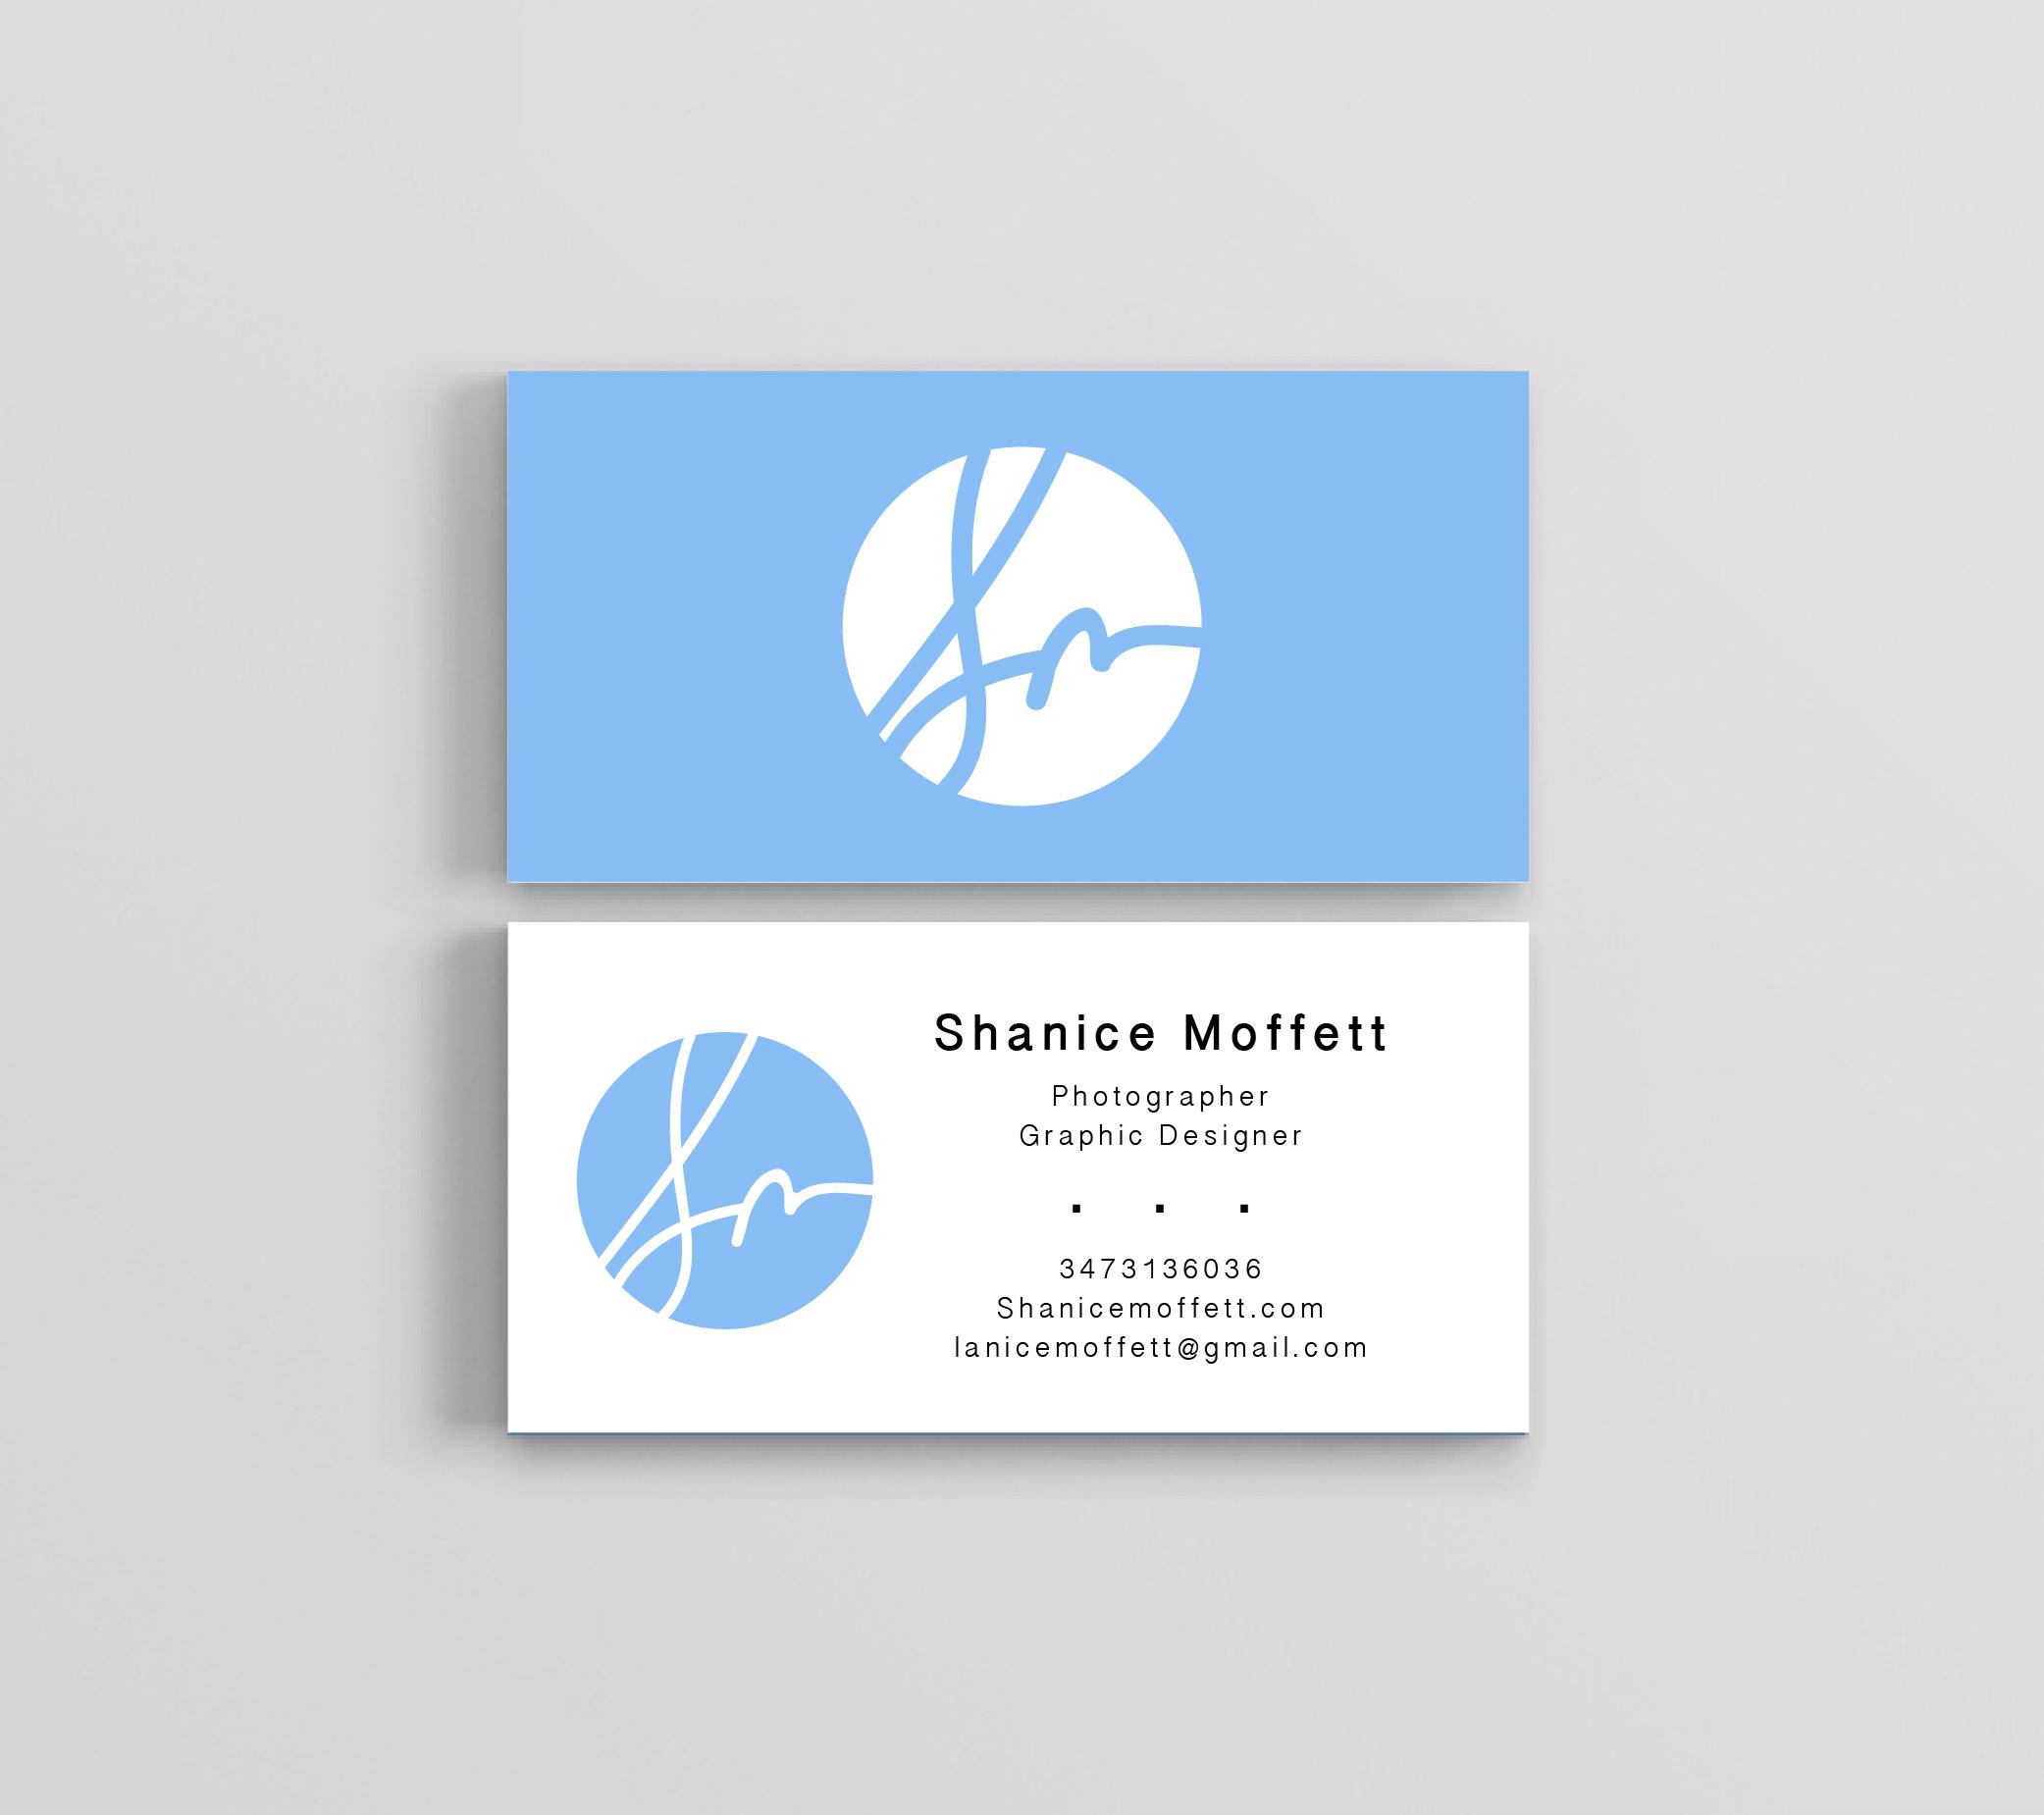 SMbusinesscard 2.jpg